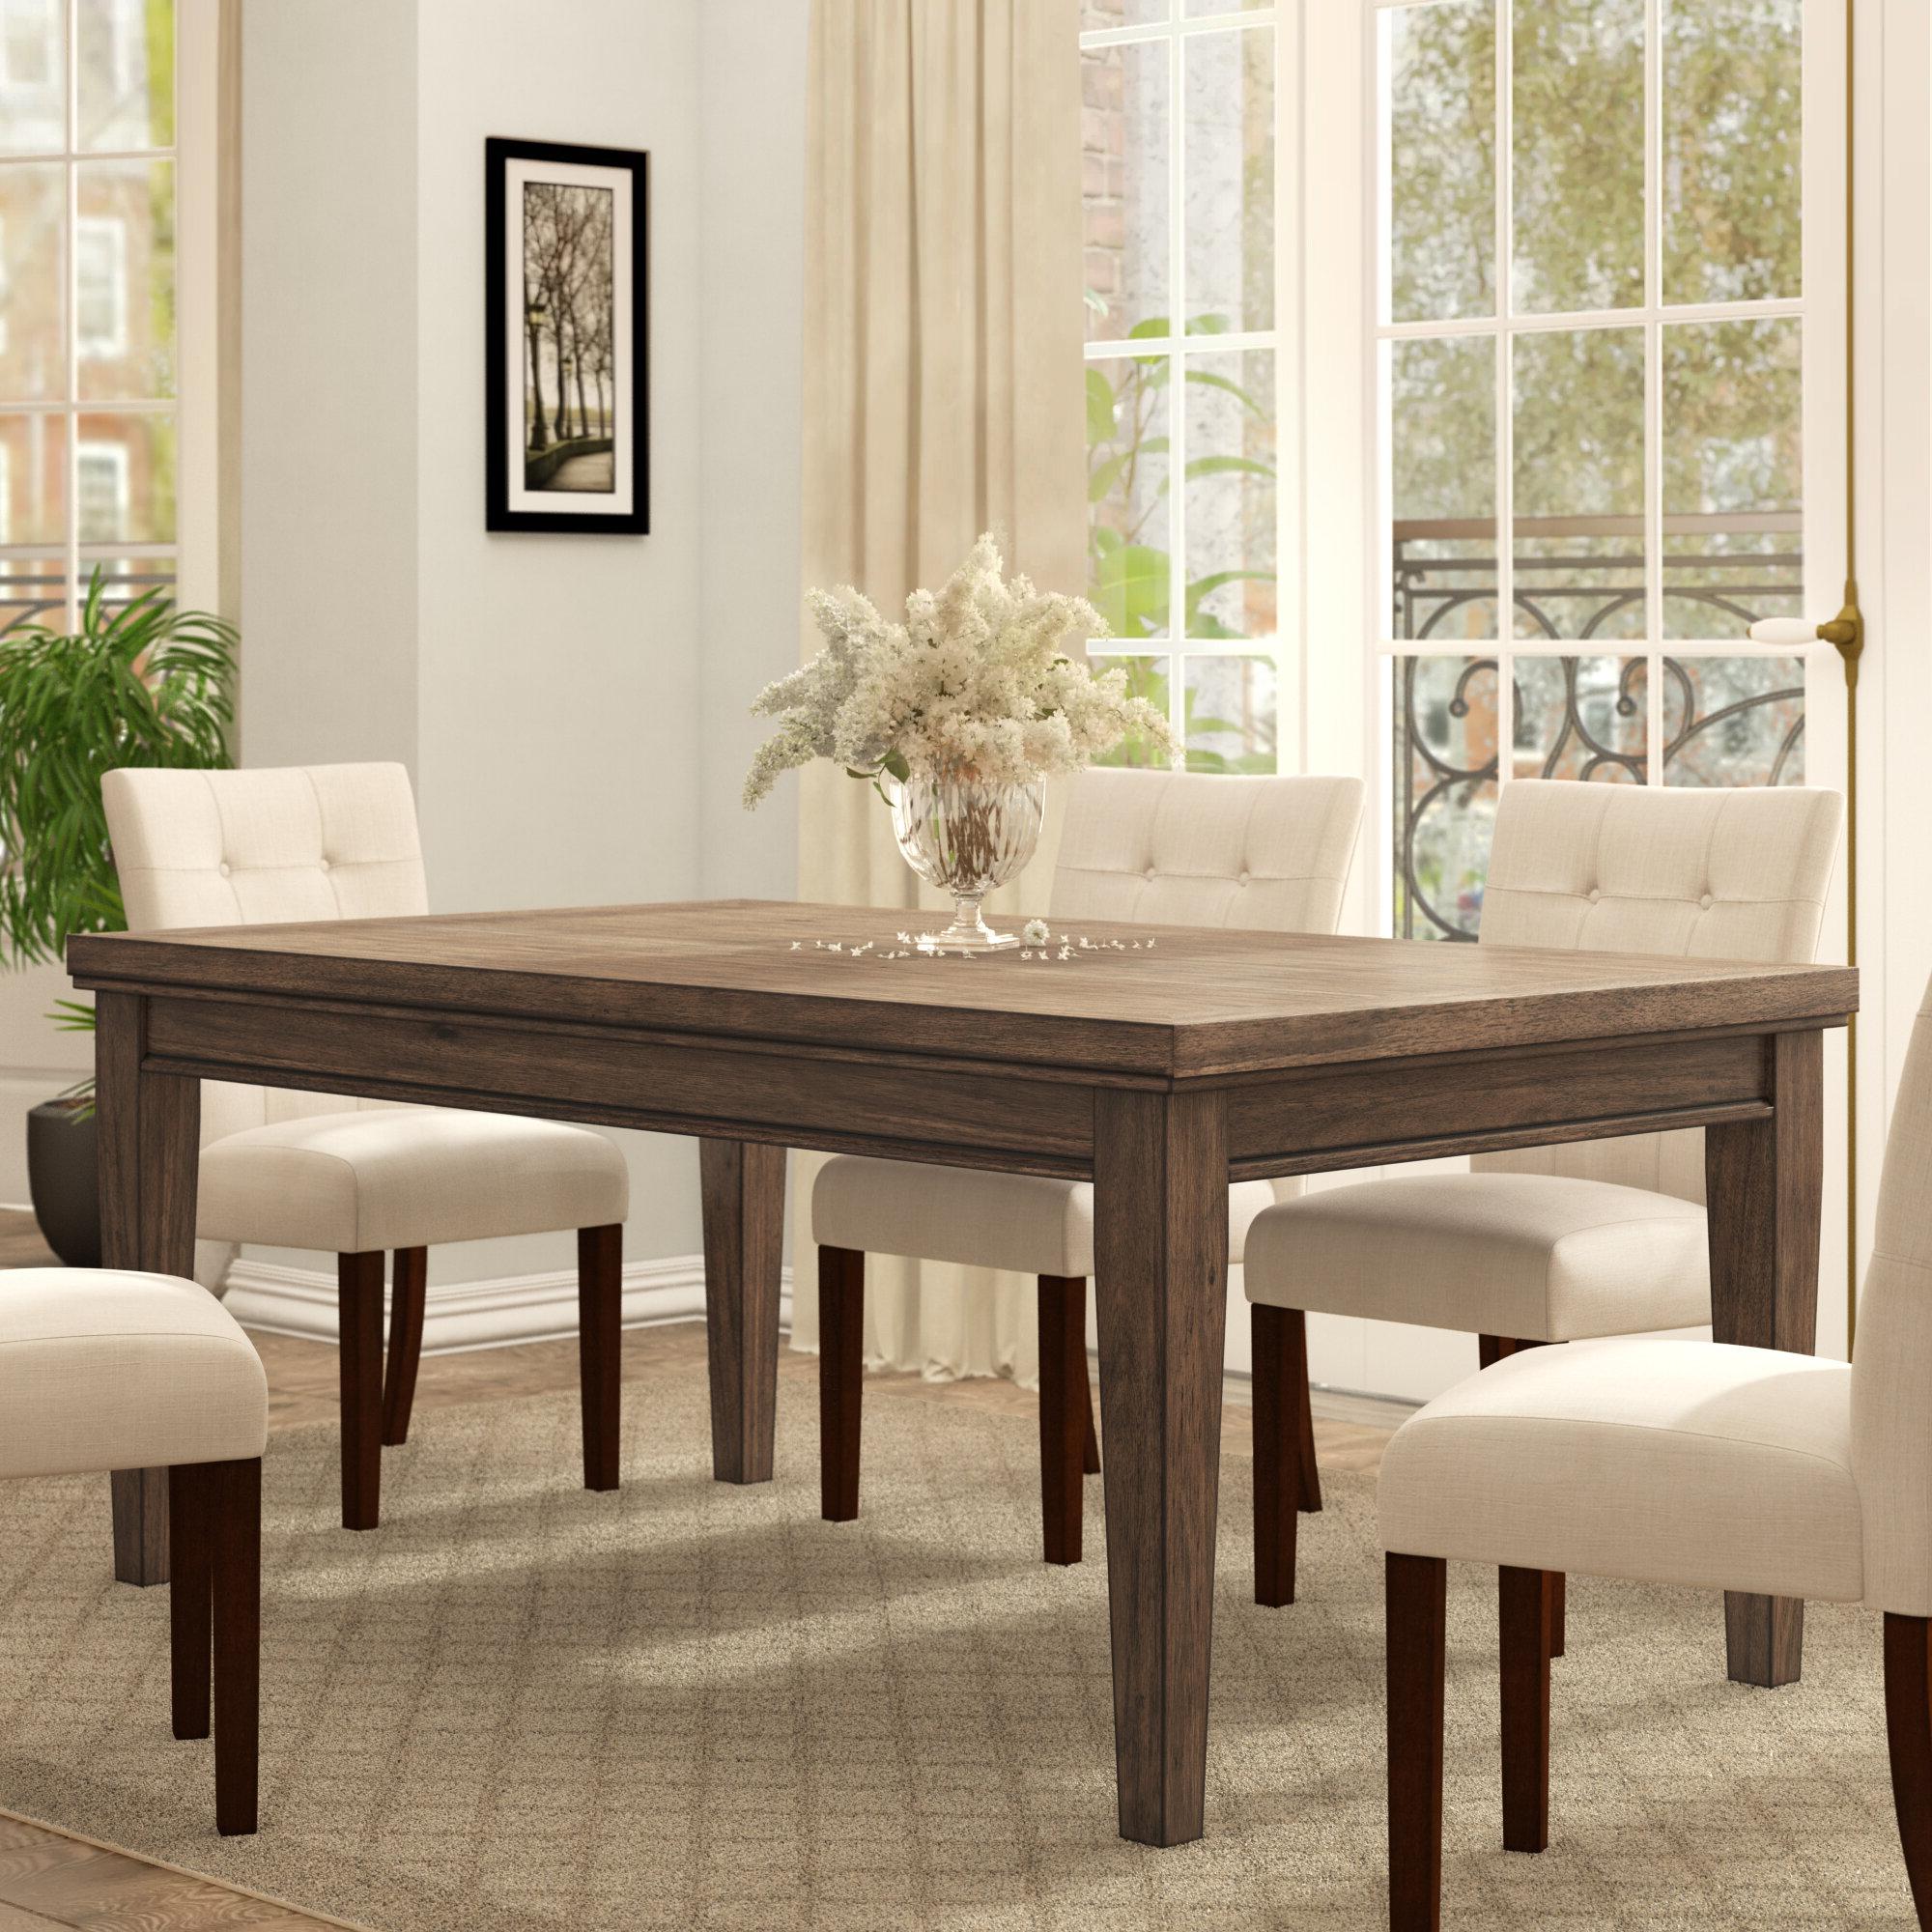 Ephraim 5 Piece Dining Sets Inside Newest Three Posts Penwortham Dining Table (Gallery 15 of 25)